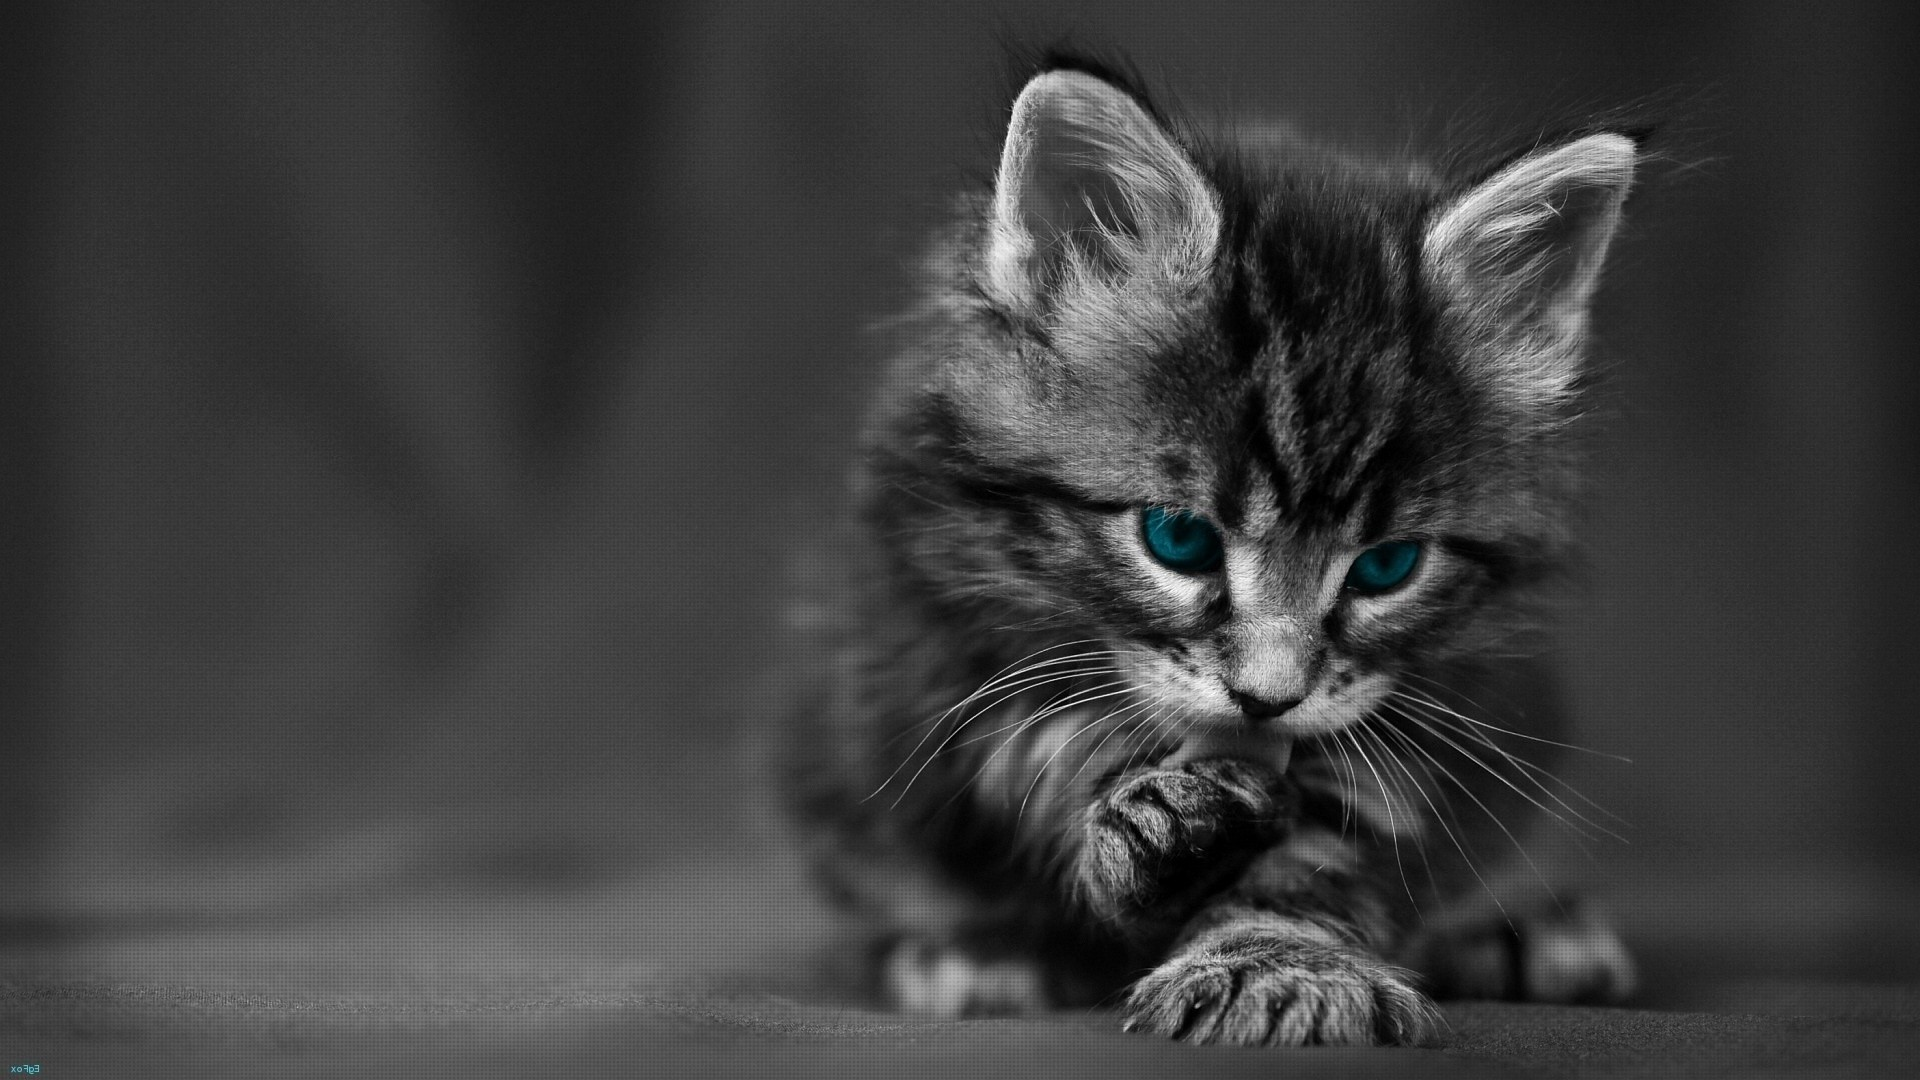 Black And White Kittens Cute Black Cat Hd 1920x1080 Wallpaper Teahub Io